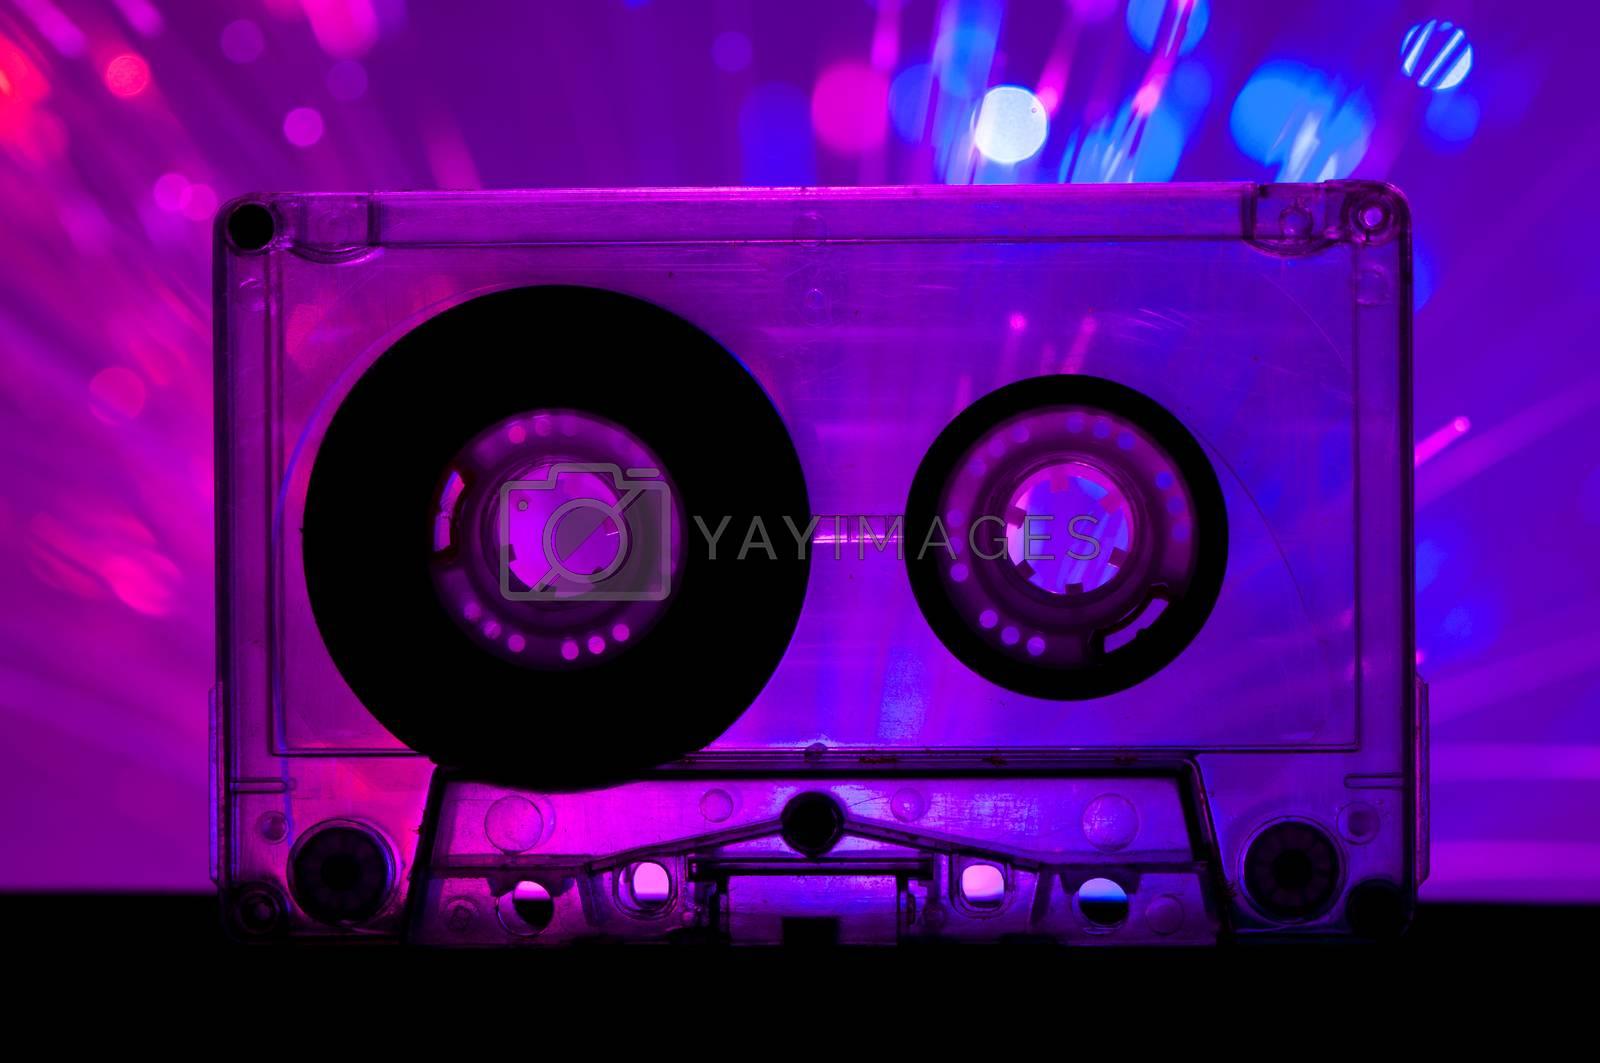 Transparent Cassette tape and blue pink color disco light background